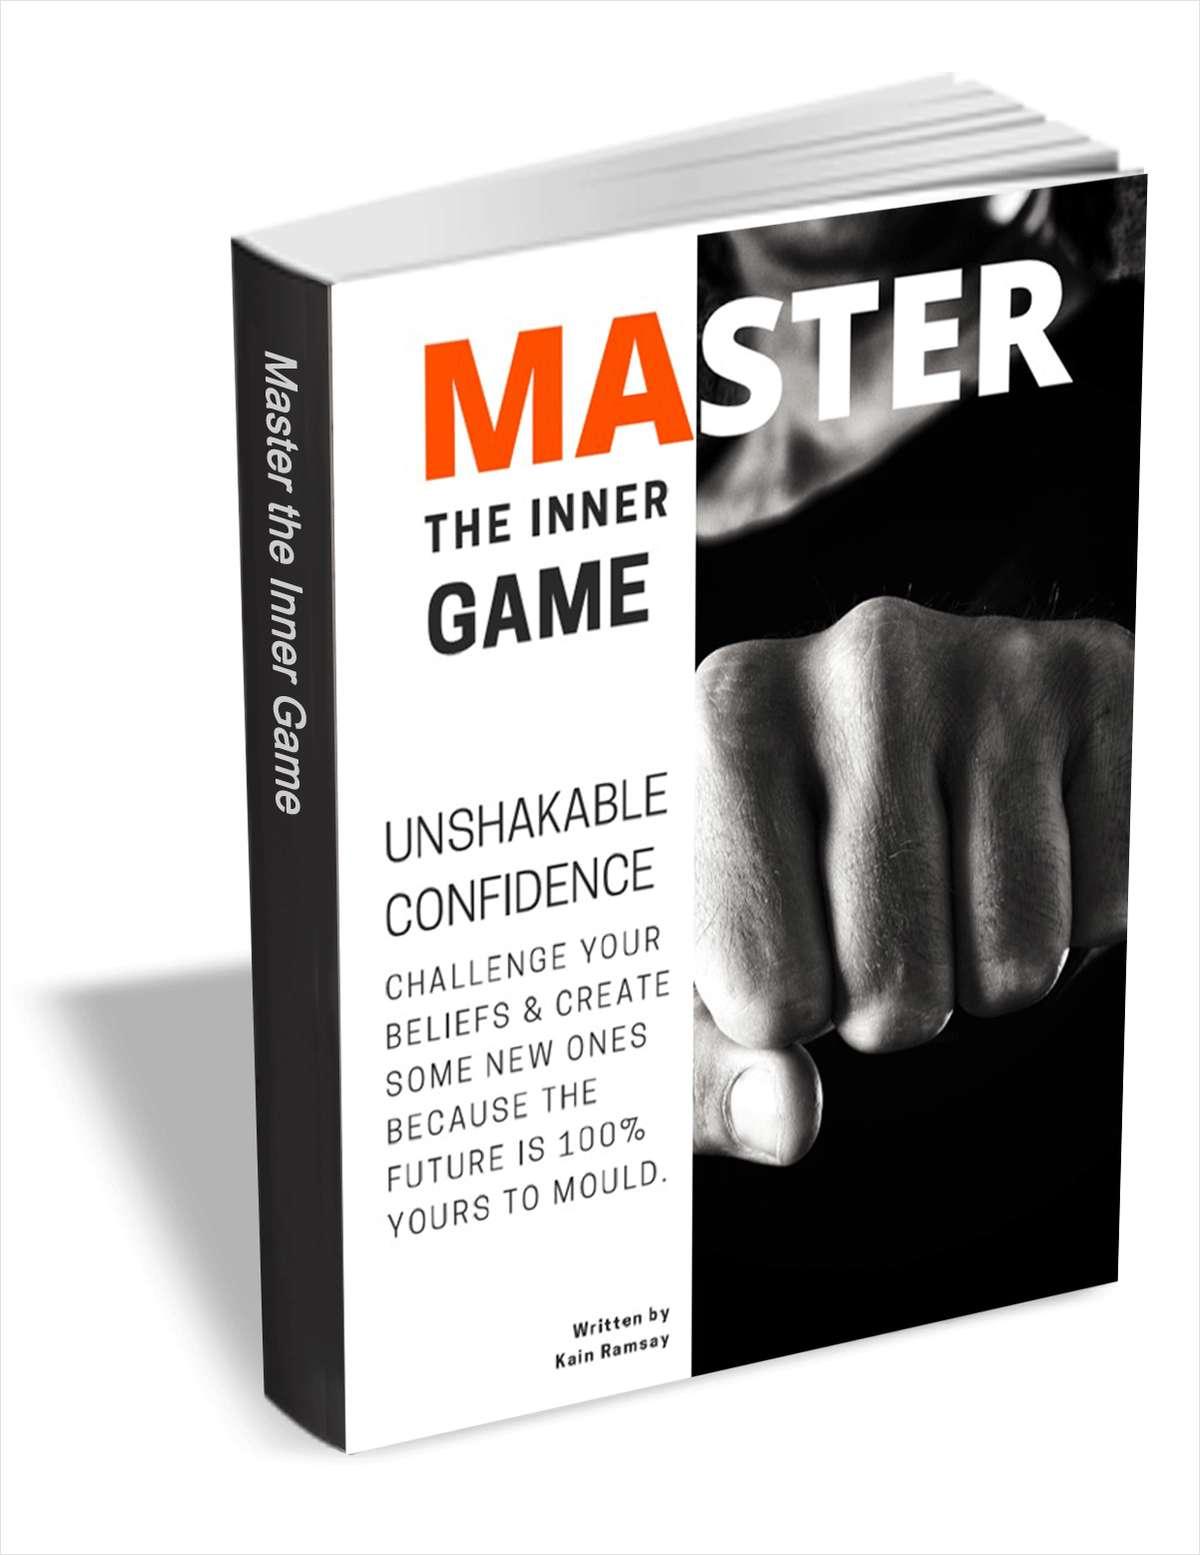 Master the Inner Game - Unshakable Confidence